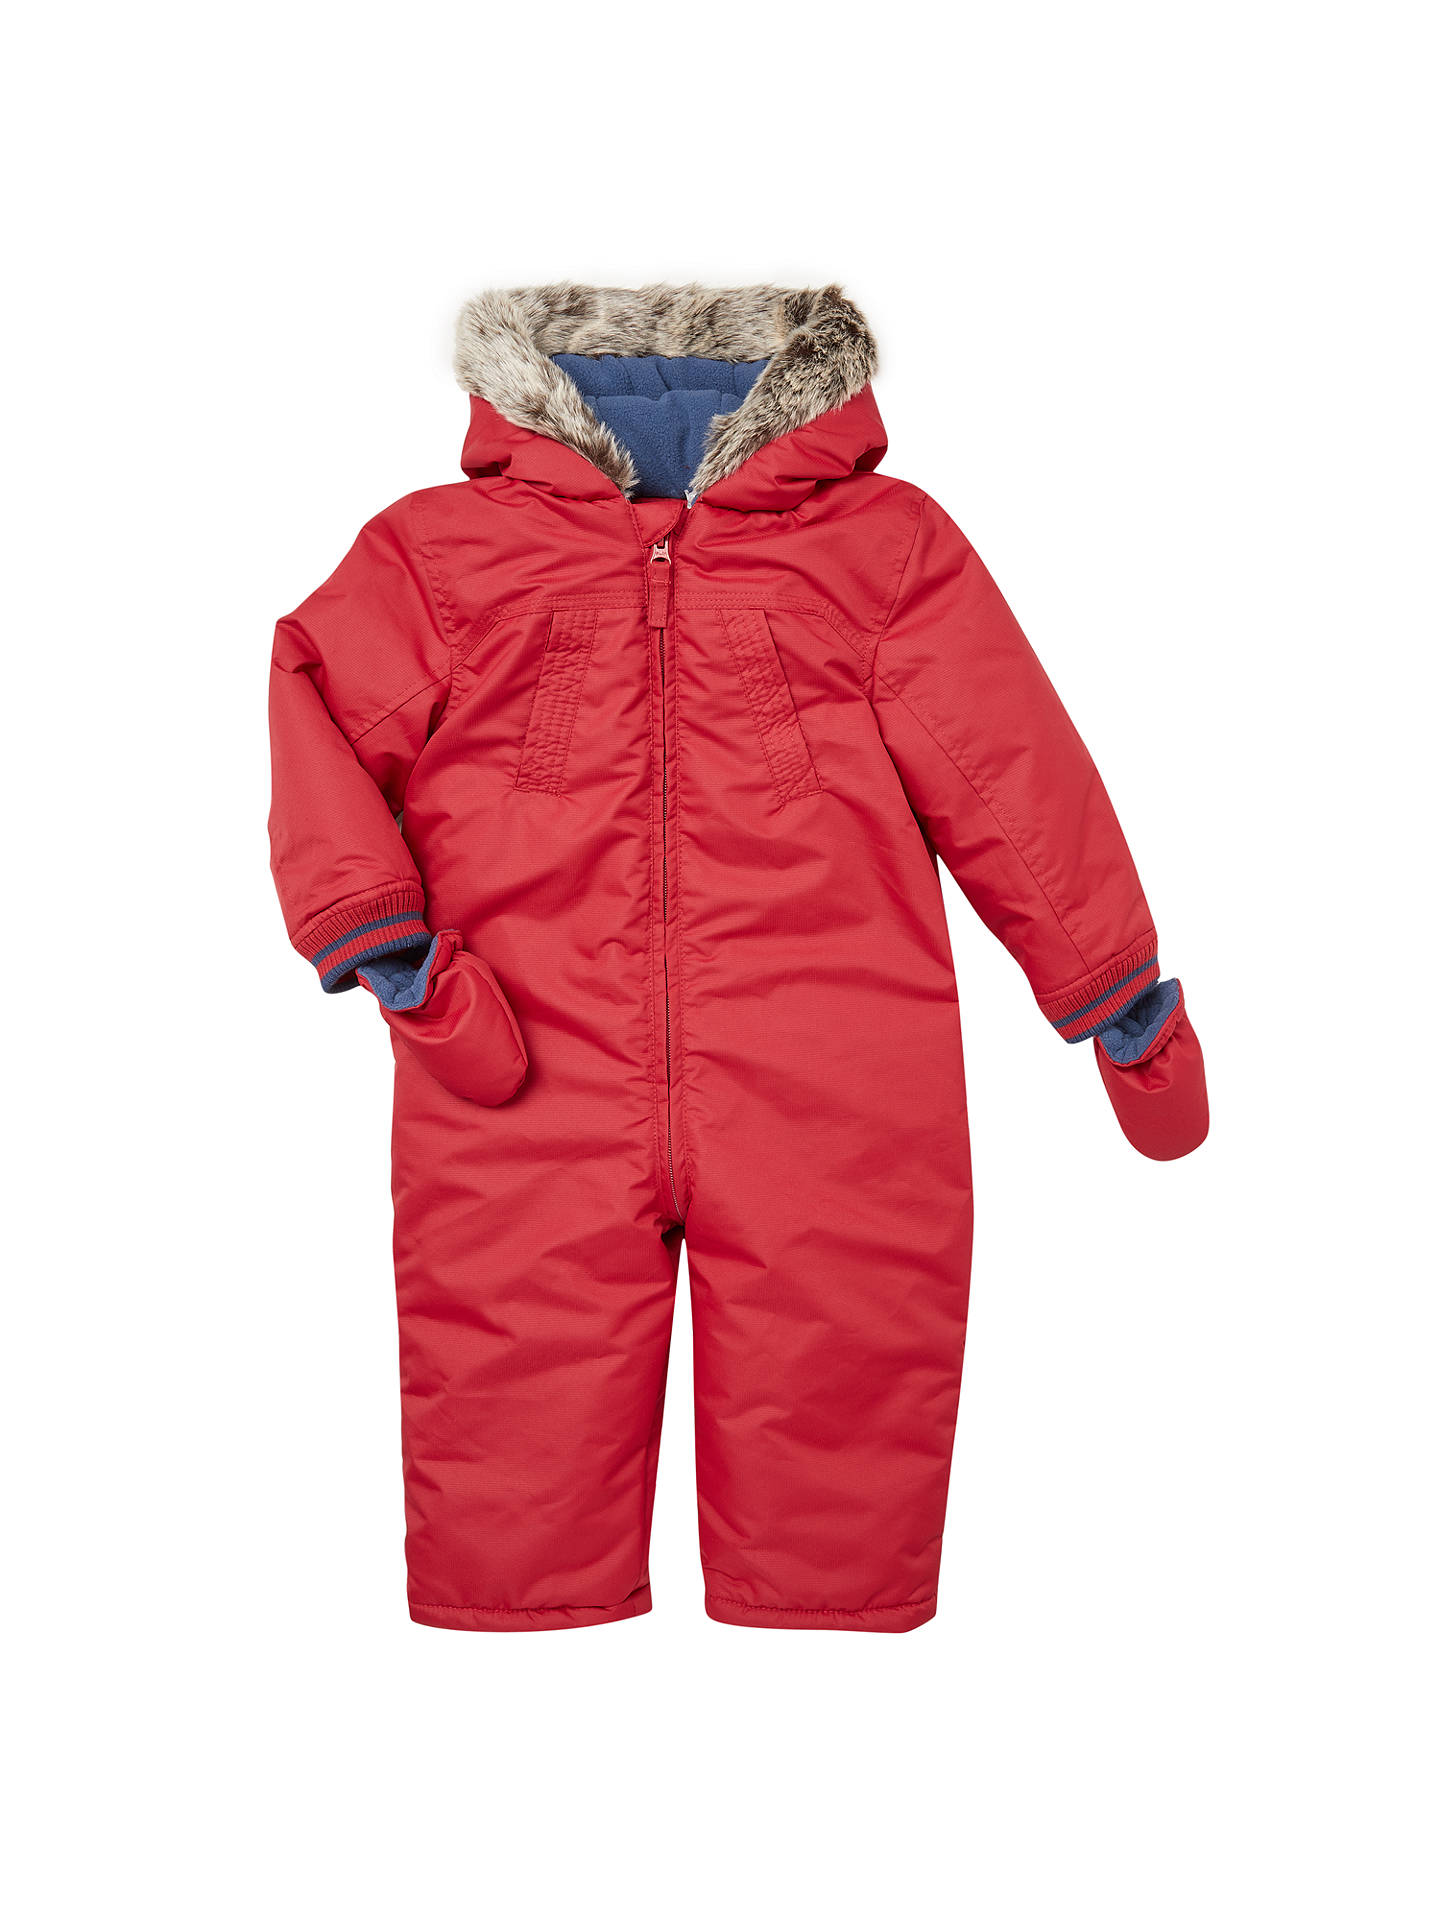 94a9807cf8e9 John Lewis Baby Faux Fur Hood Snowsuit